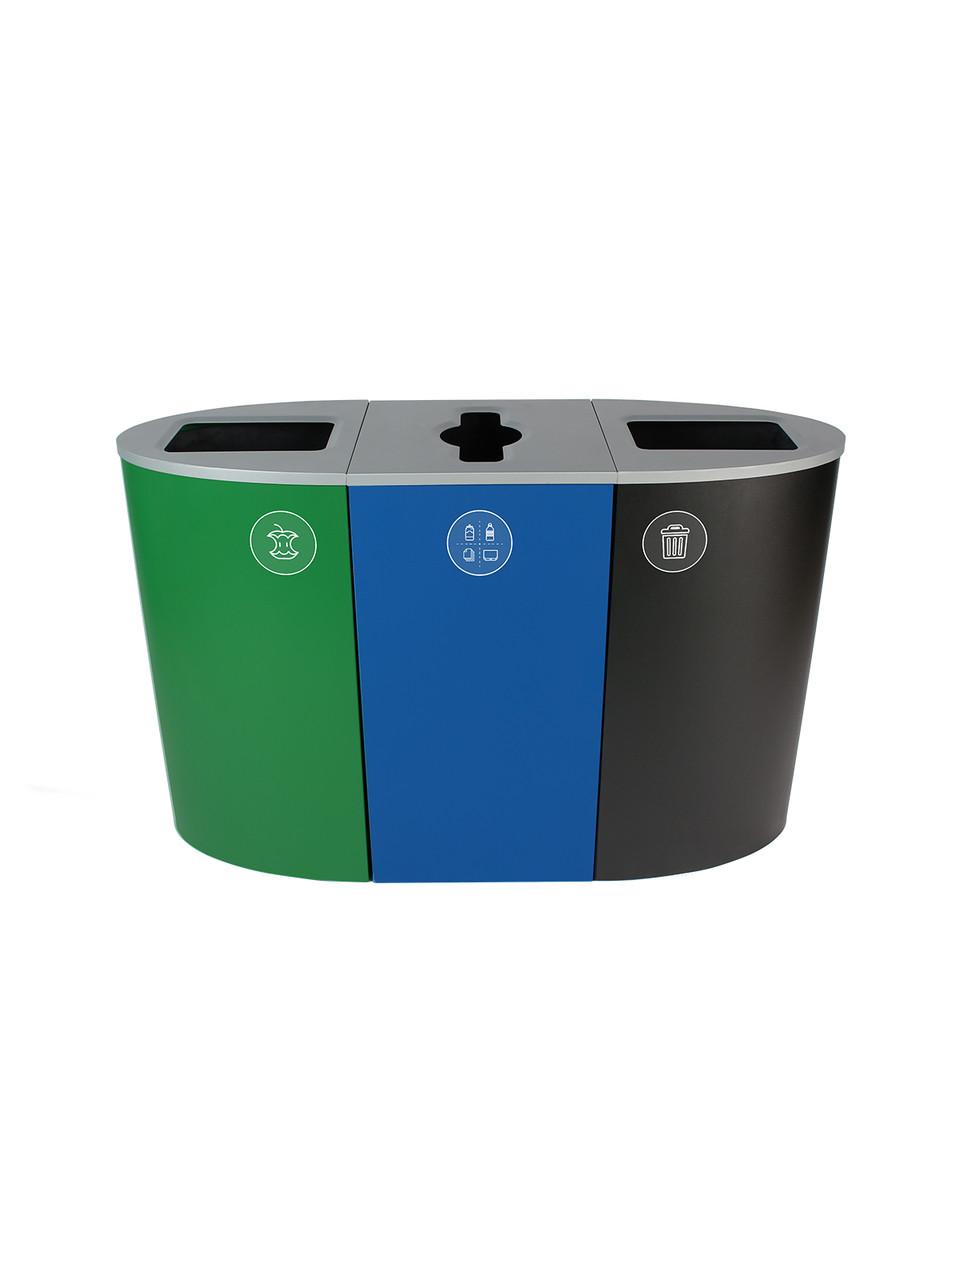 68 Gallon Spectrum Triple Recycling Station Green/Blue/Black 8107104-424